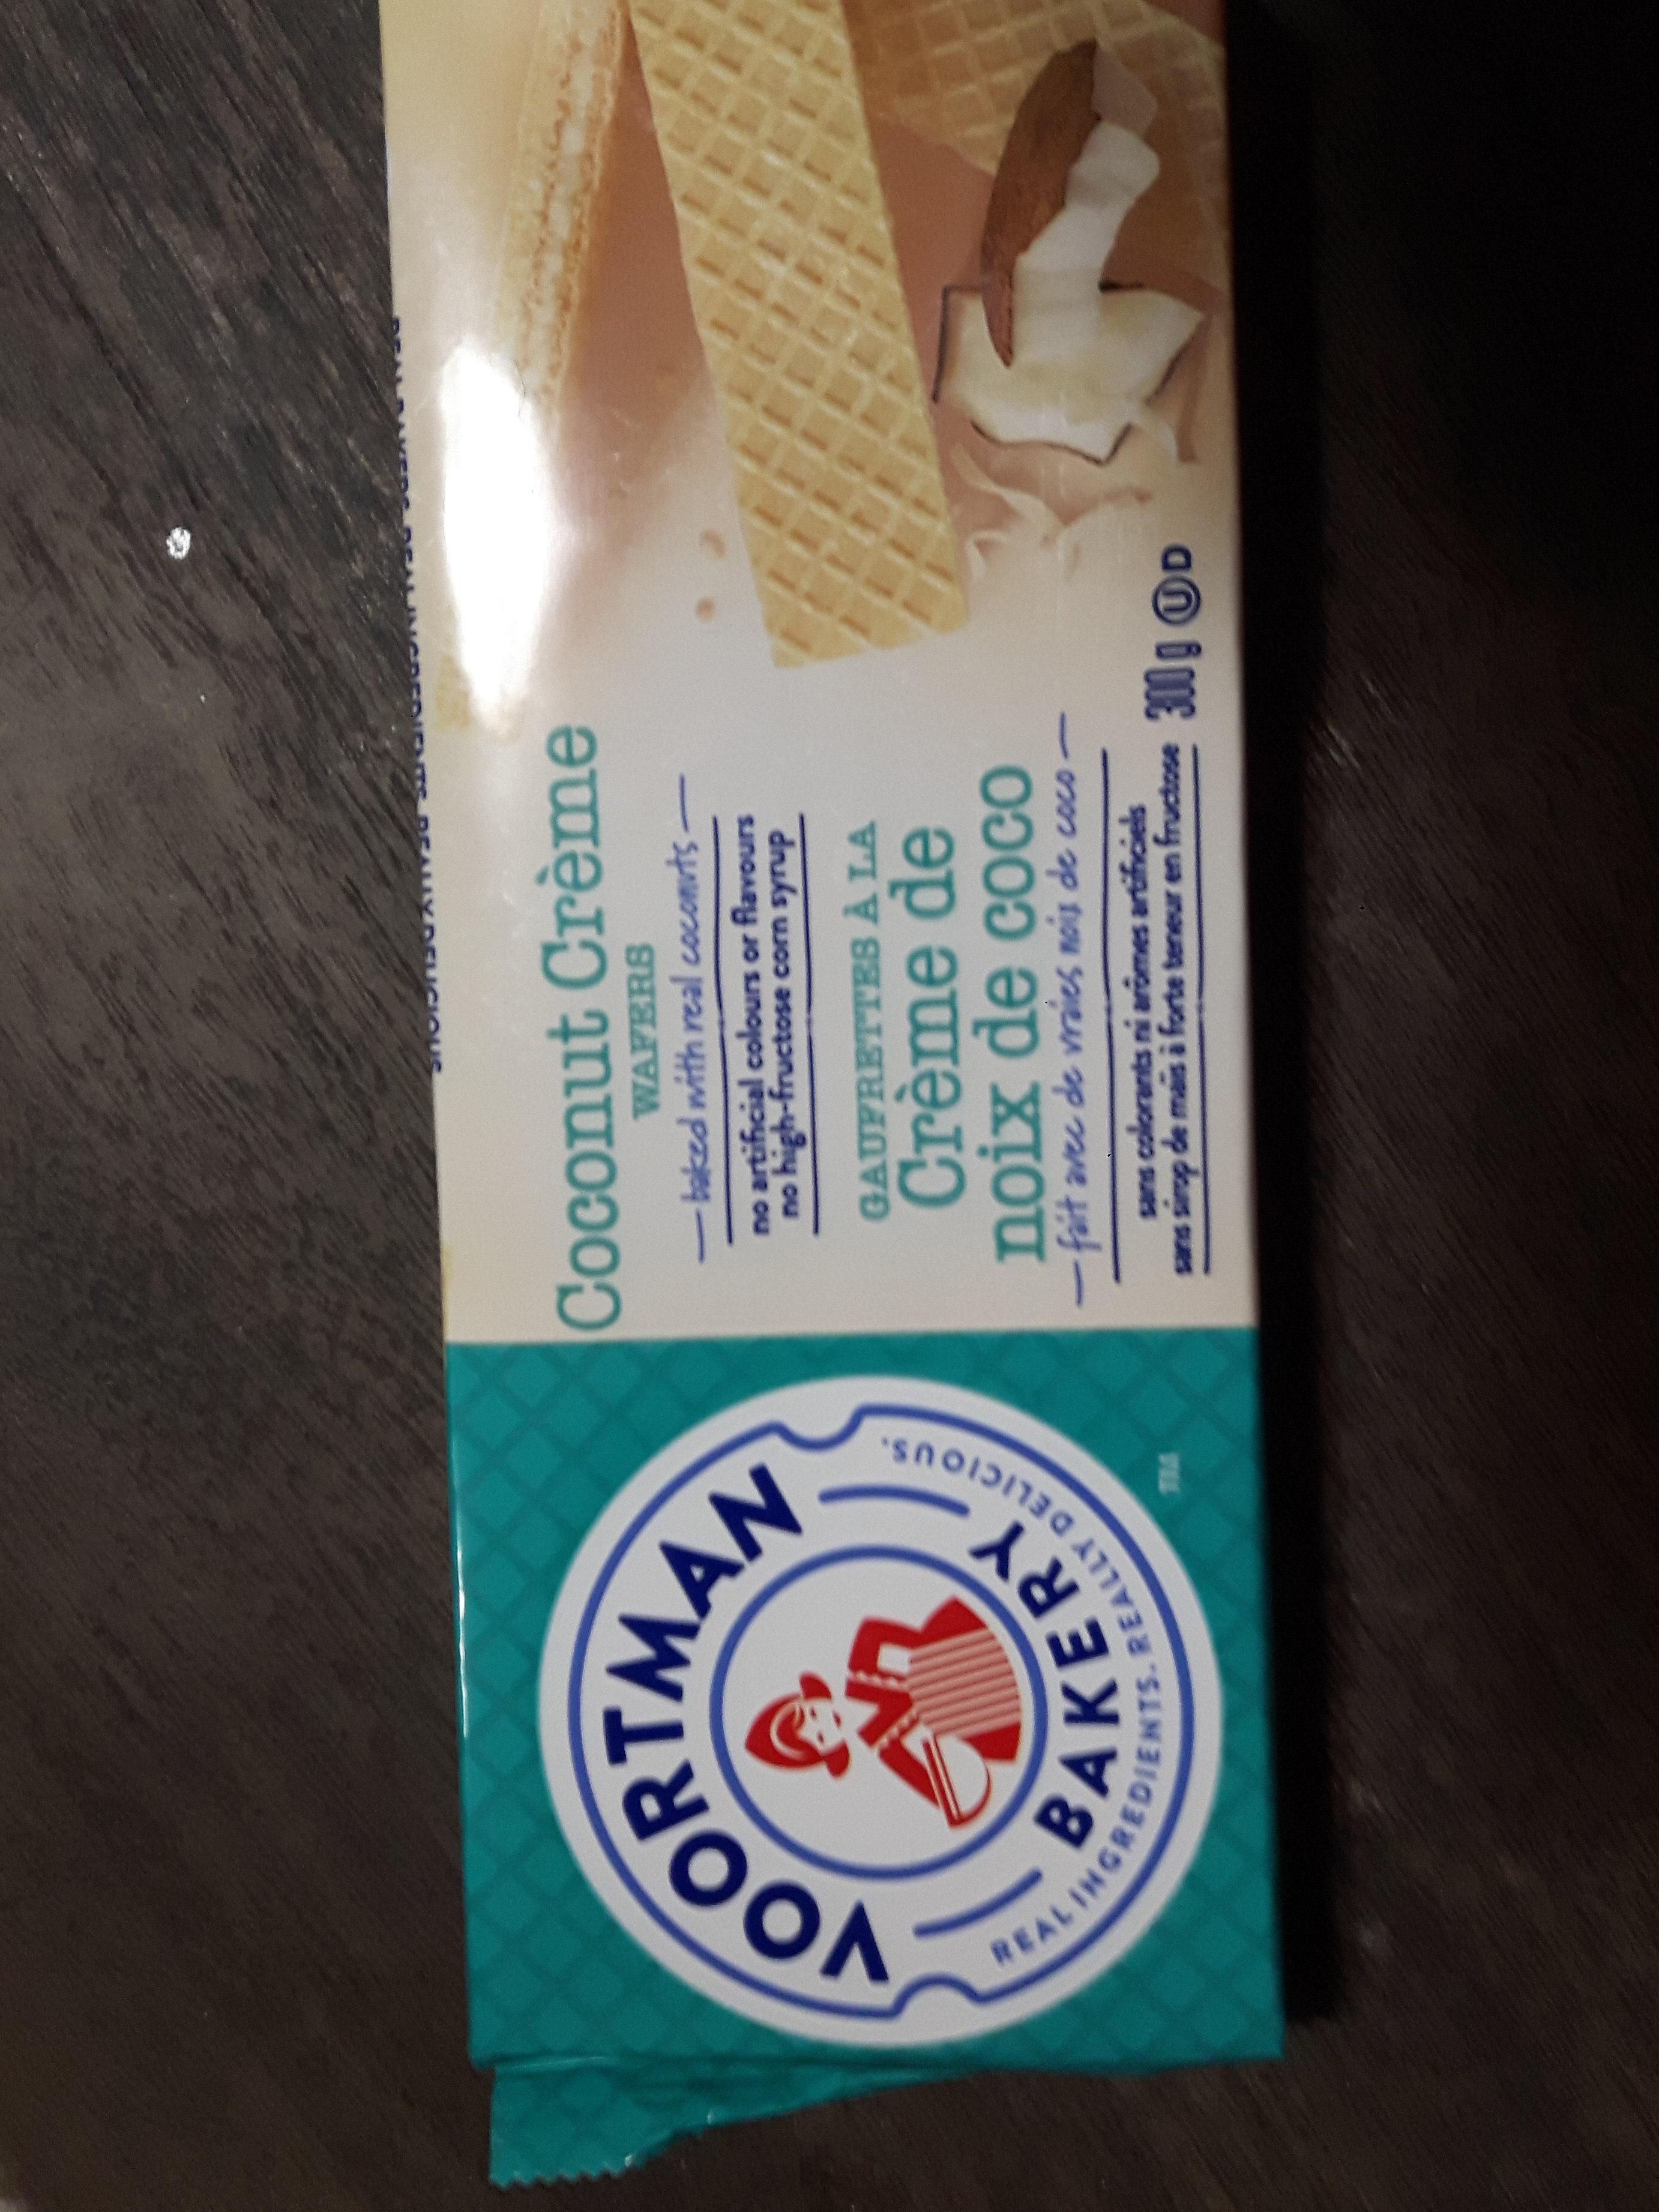 Bakery coconut creme wafers - Produit - fr